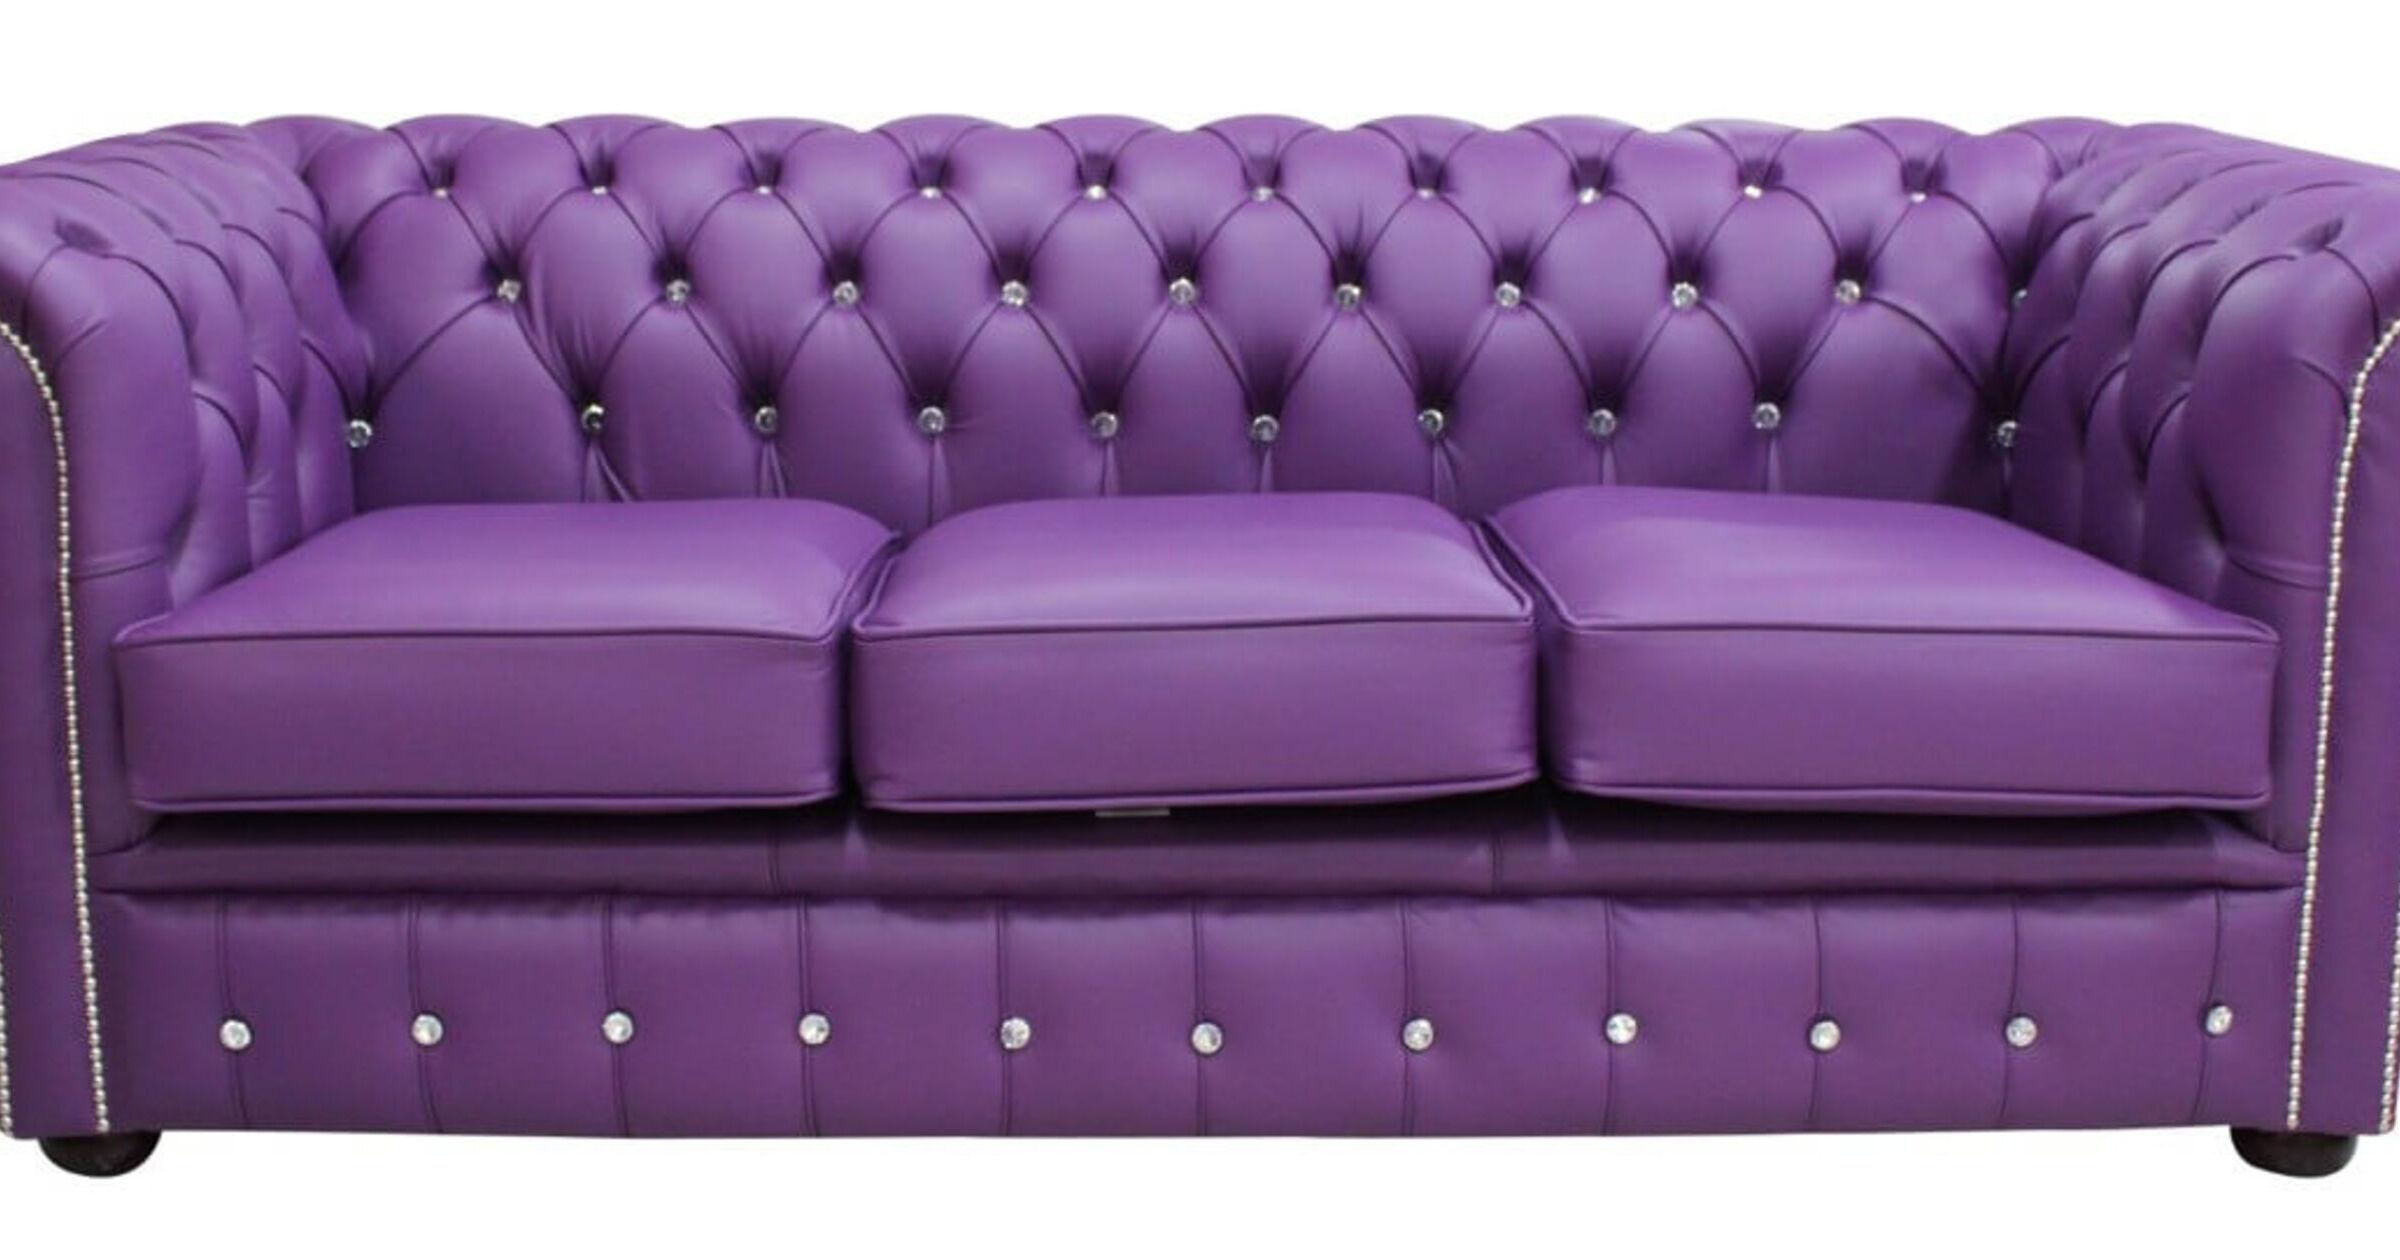 Purple Chesterfield Crystal Sofa Designersofas4u